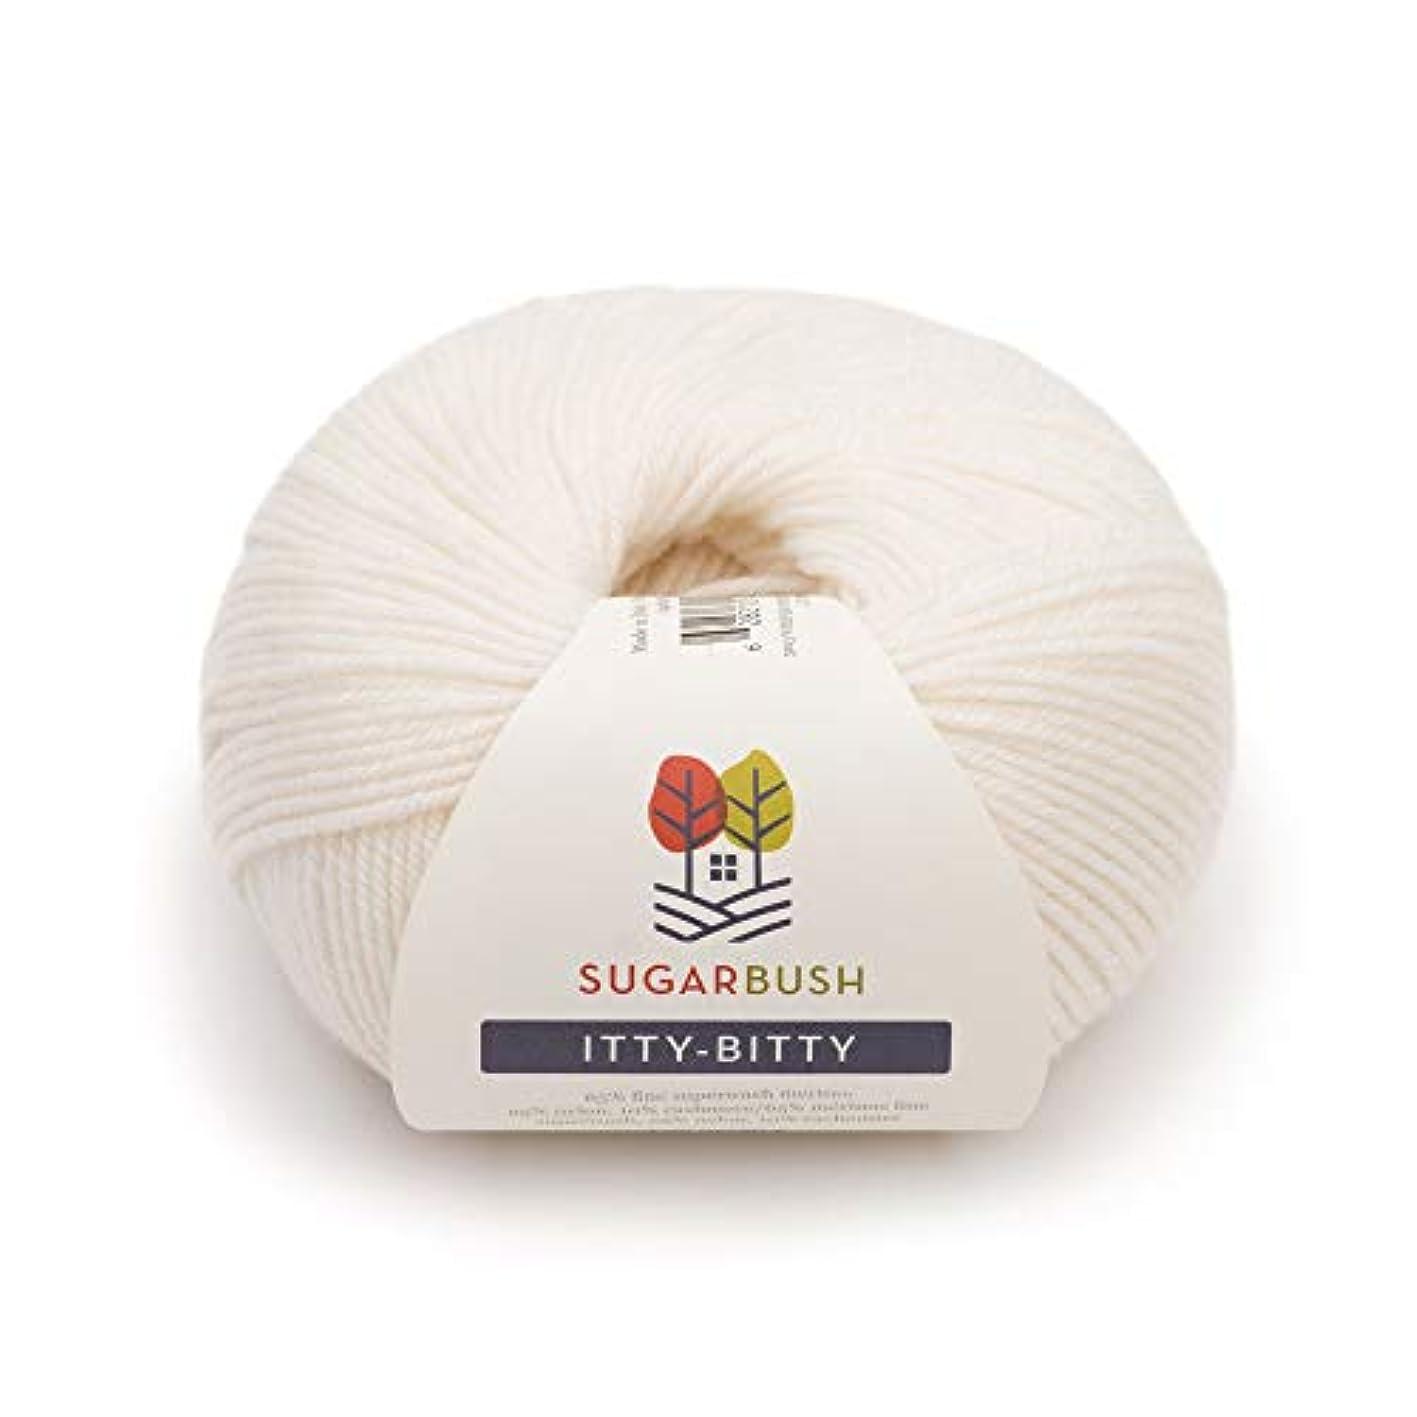 Sugar Bush Yarn Itty-Bitty Fine Weight, Whisper White cdddfuwytdp362